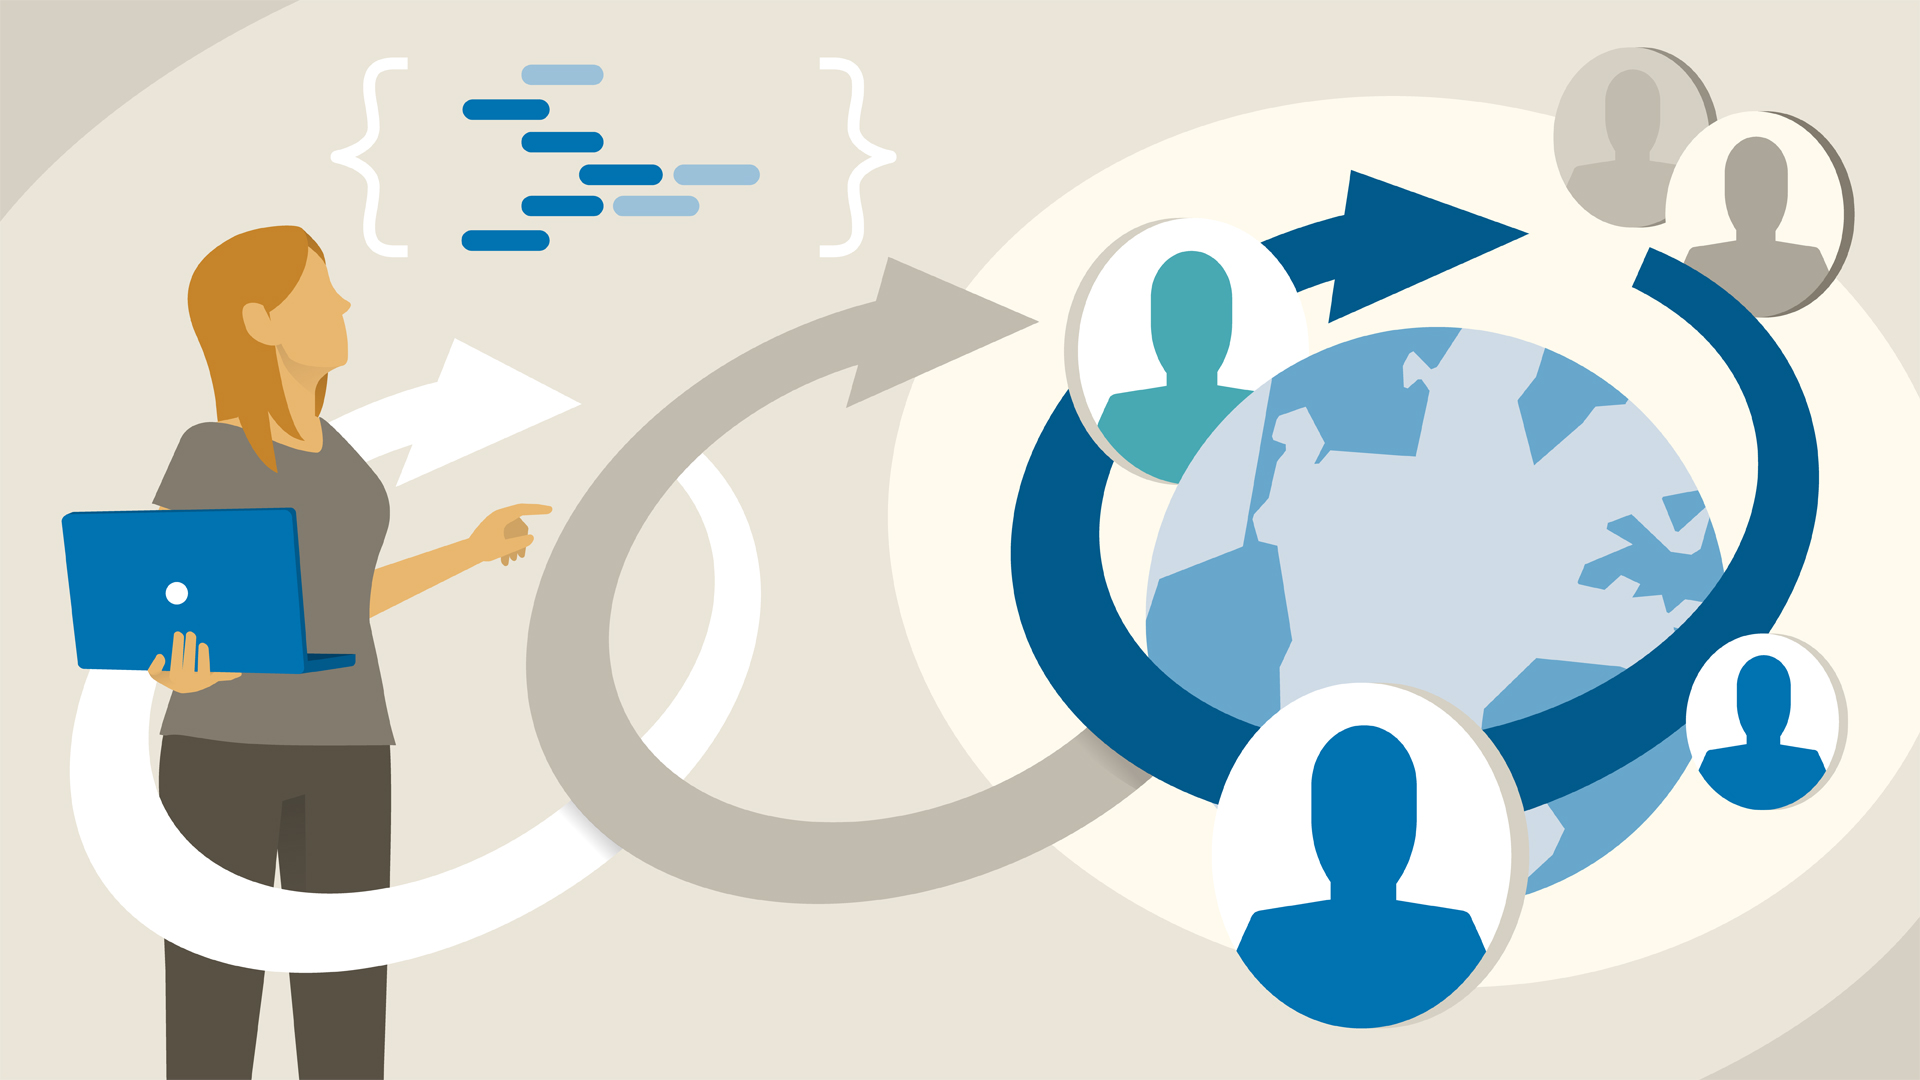 Remote-first culture for agile teams: Agile Software Development: Remote Teams